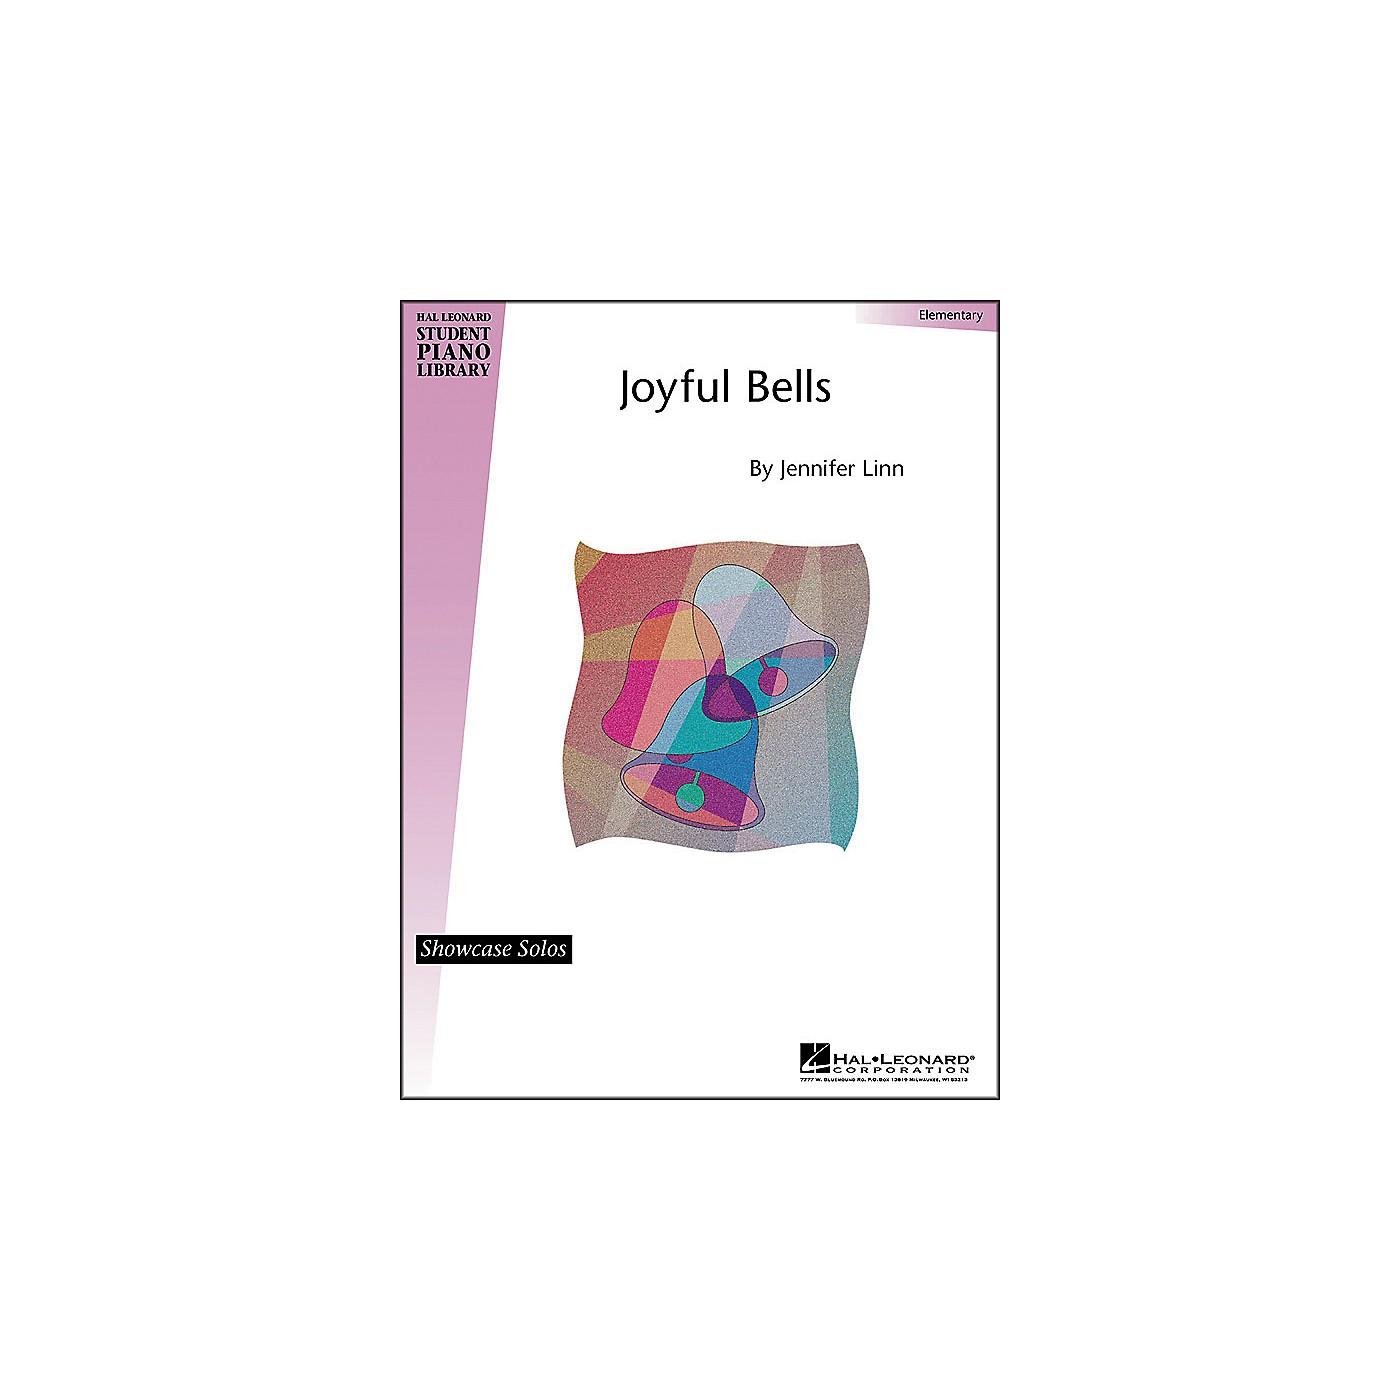 Hal Leonard Joyful Bells Elementary Showcase Solos Hl Student Piano Library by Jennifer Linn thumbnail